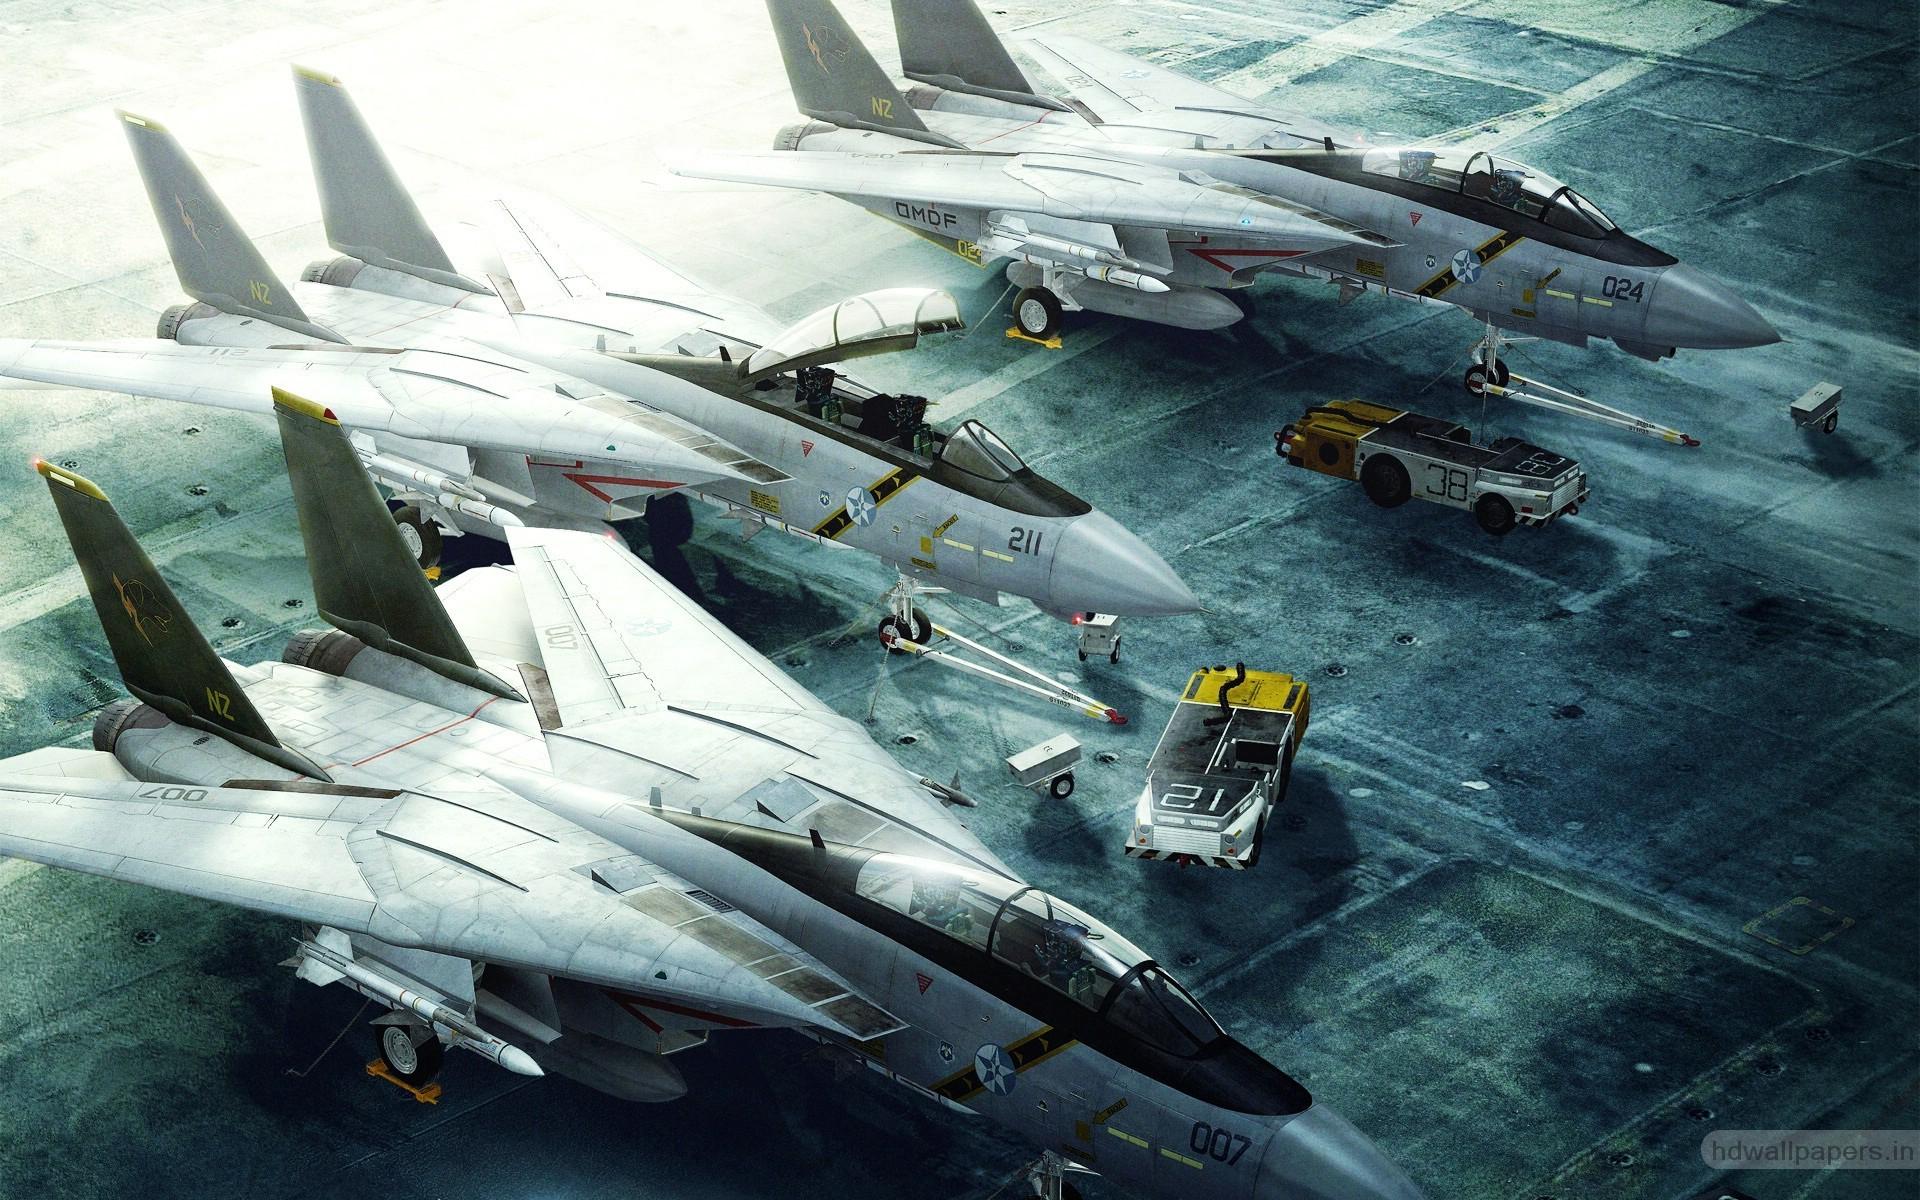 Grumman F 14 Tomcat Wallpapers   HD Wallpapers